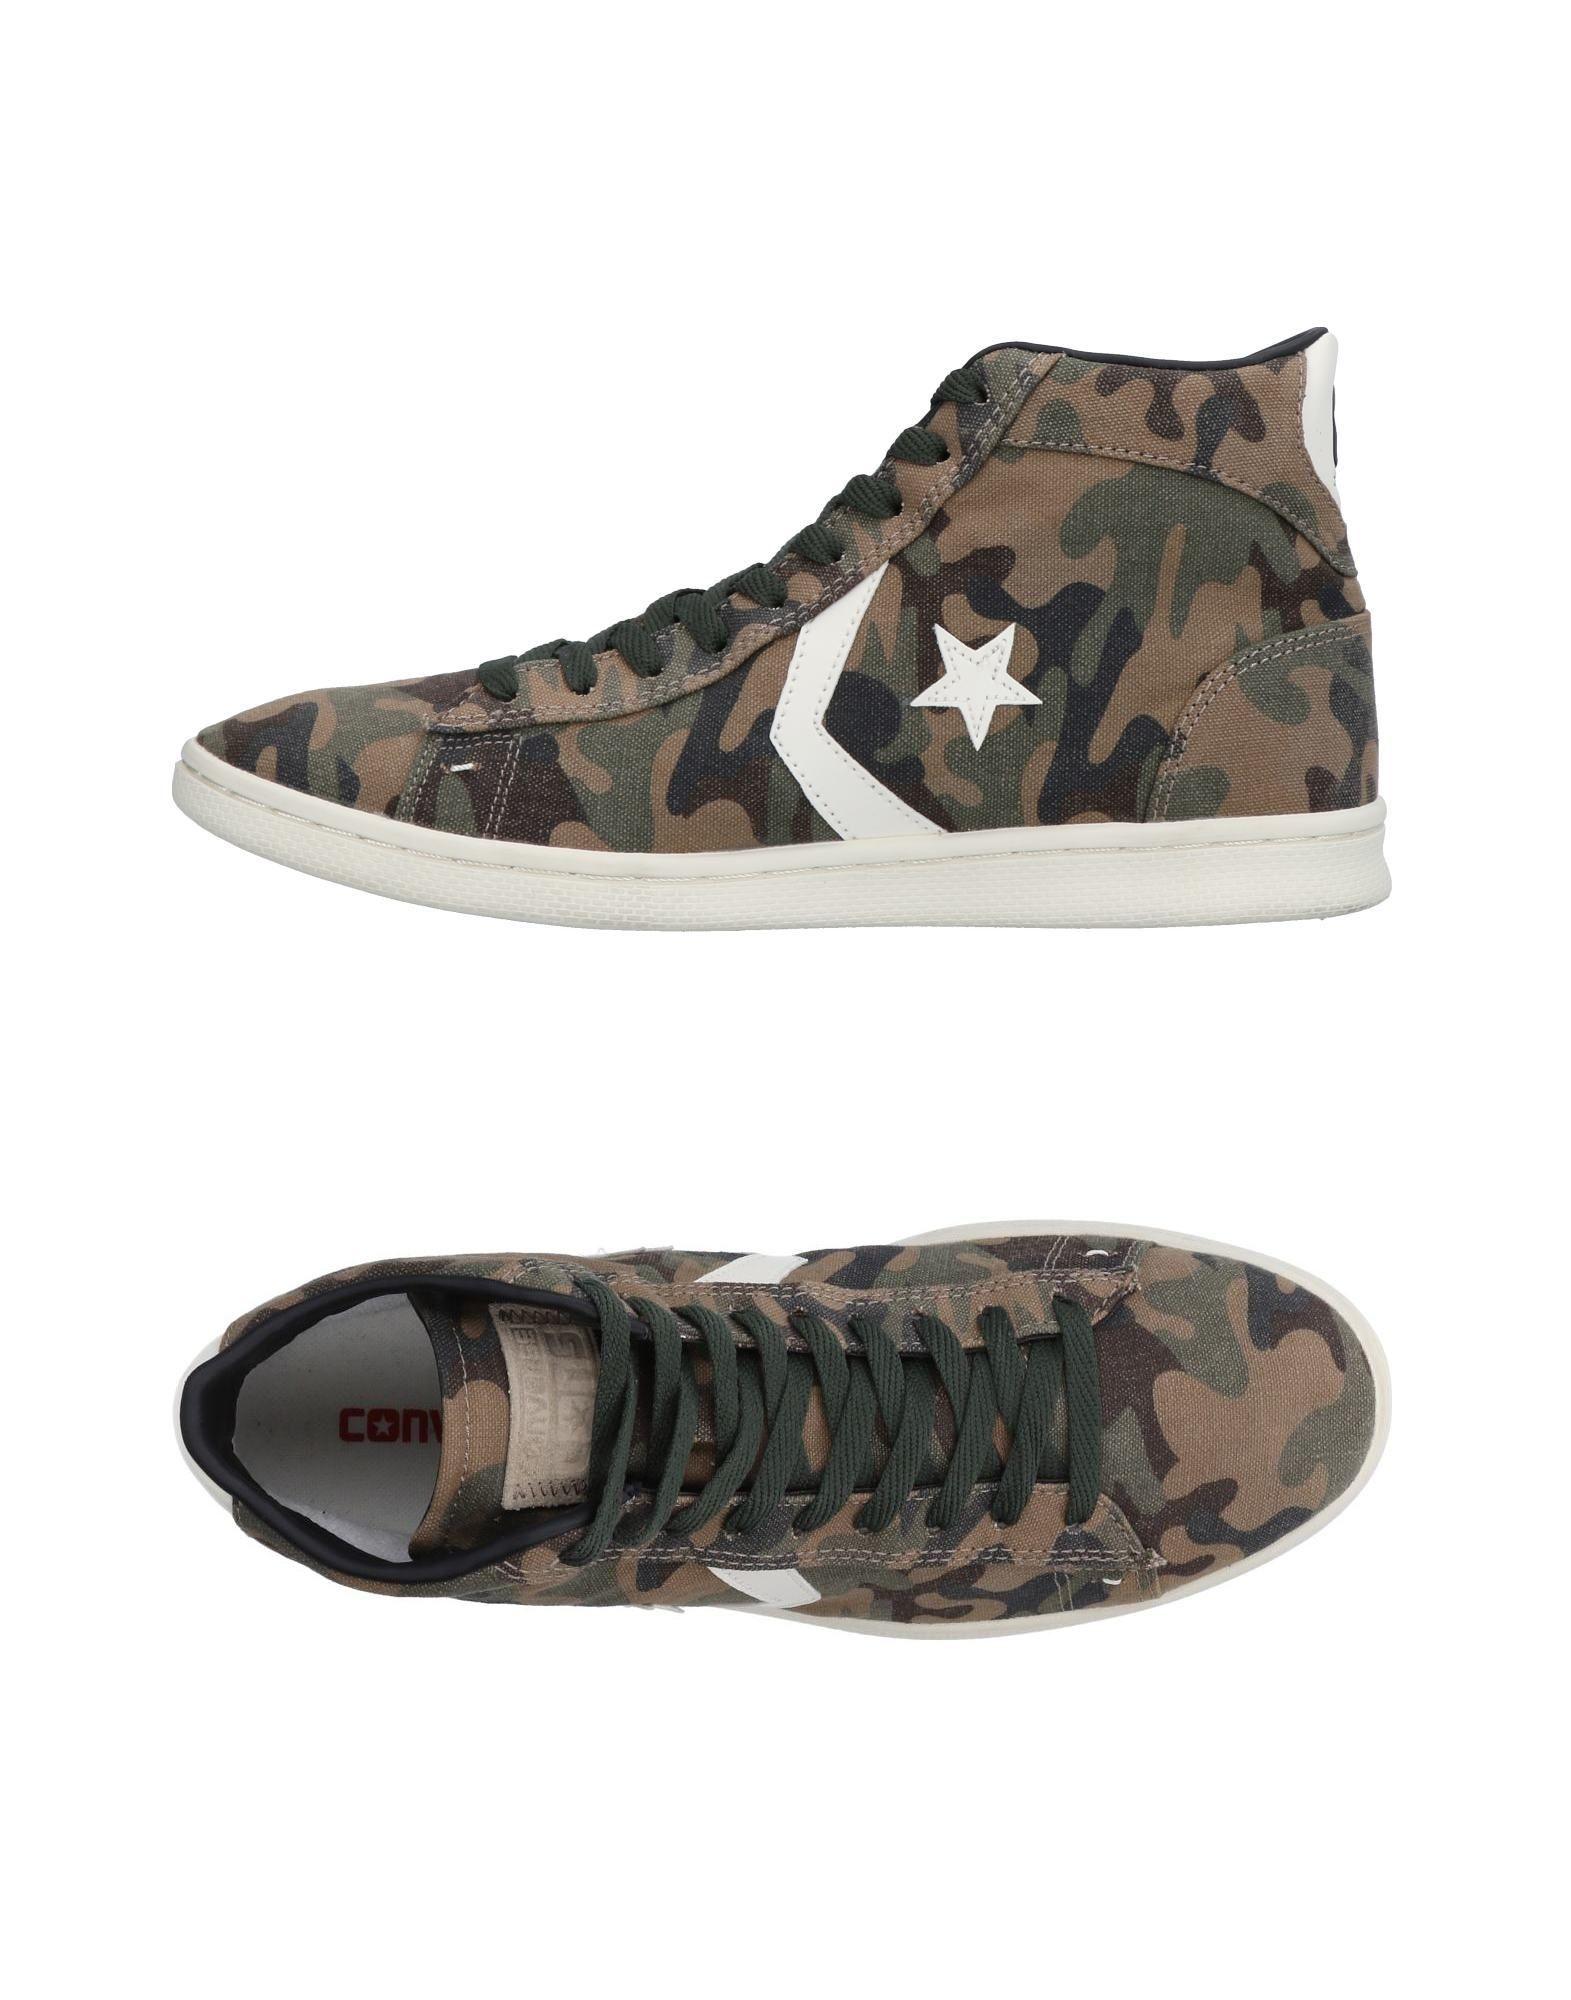 Rabatt echte Schuhe Converse All Star Sneakers Herren  11512370RL